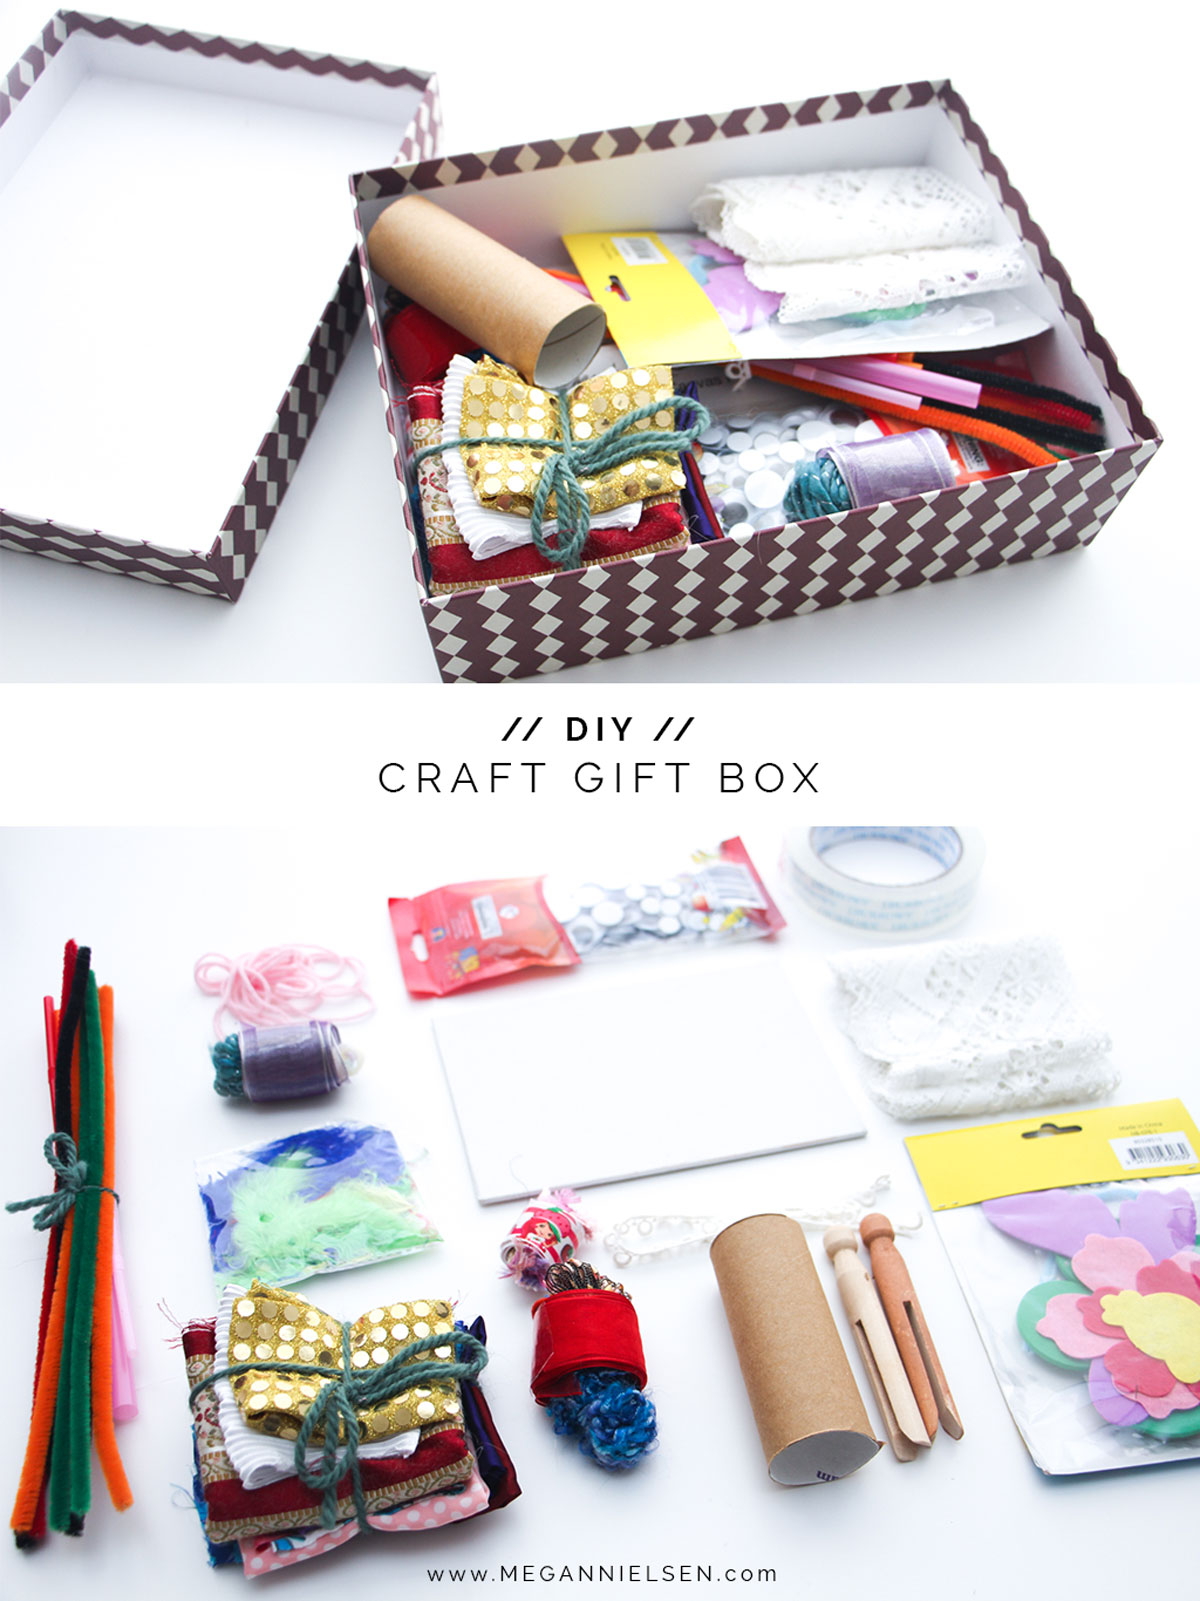 An amazing DIY craft gift box — megan nielsen design diary